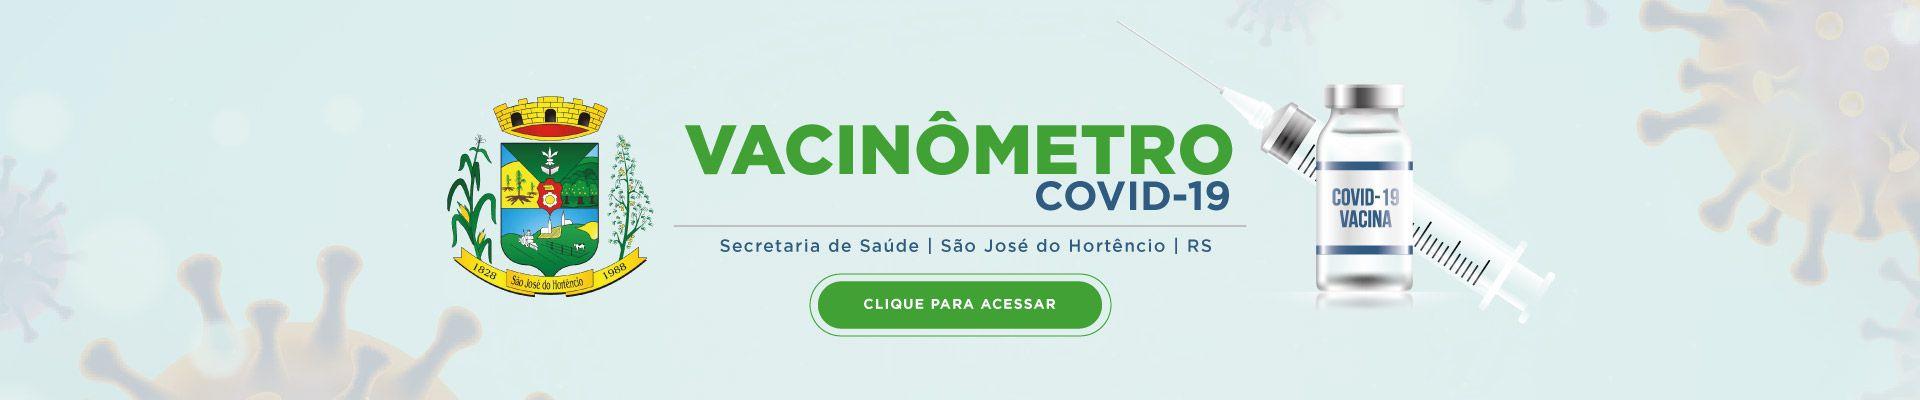 Banner 2 - Vacinômetro